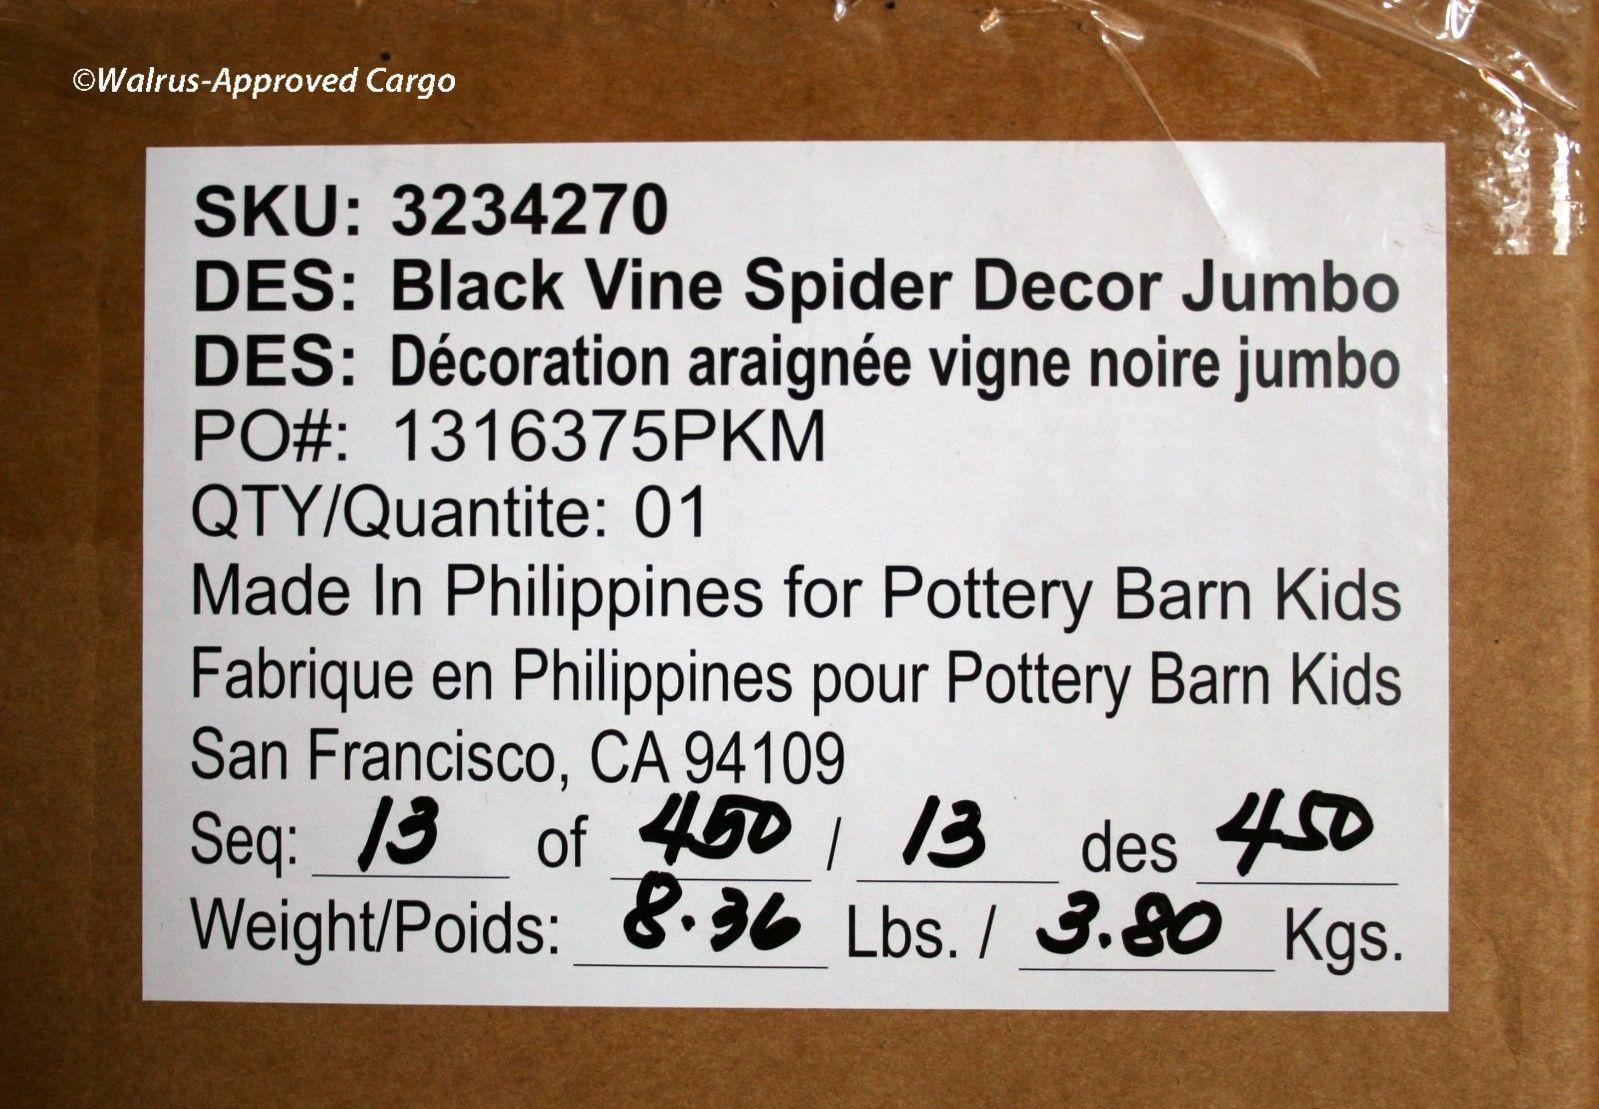 POTTERY BARN BLACK VINE SPIDER DÉCOR (JUMBO) -NIB- SPIN A WEB OF HALLOWEEN FUN!